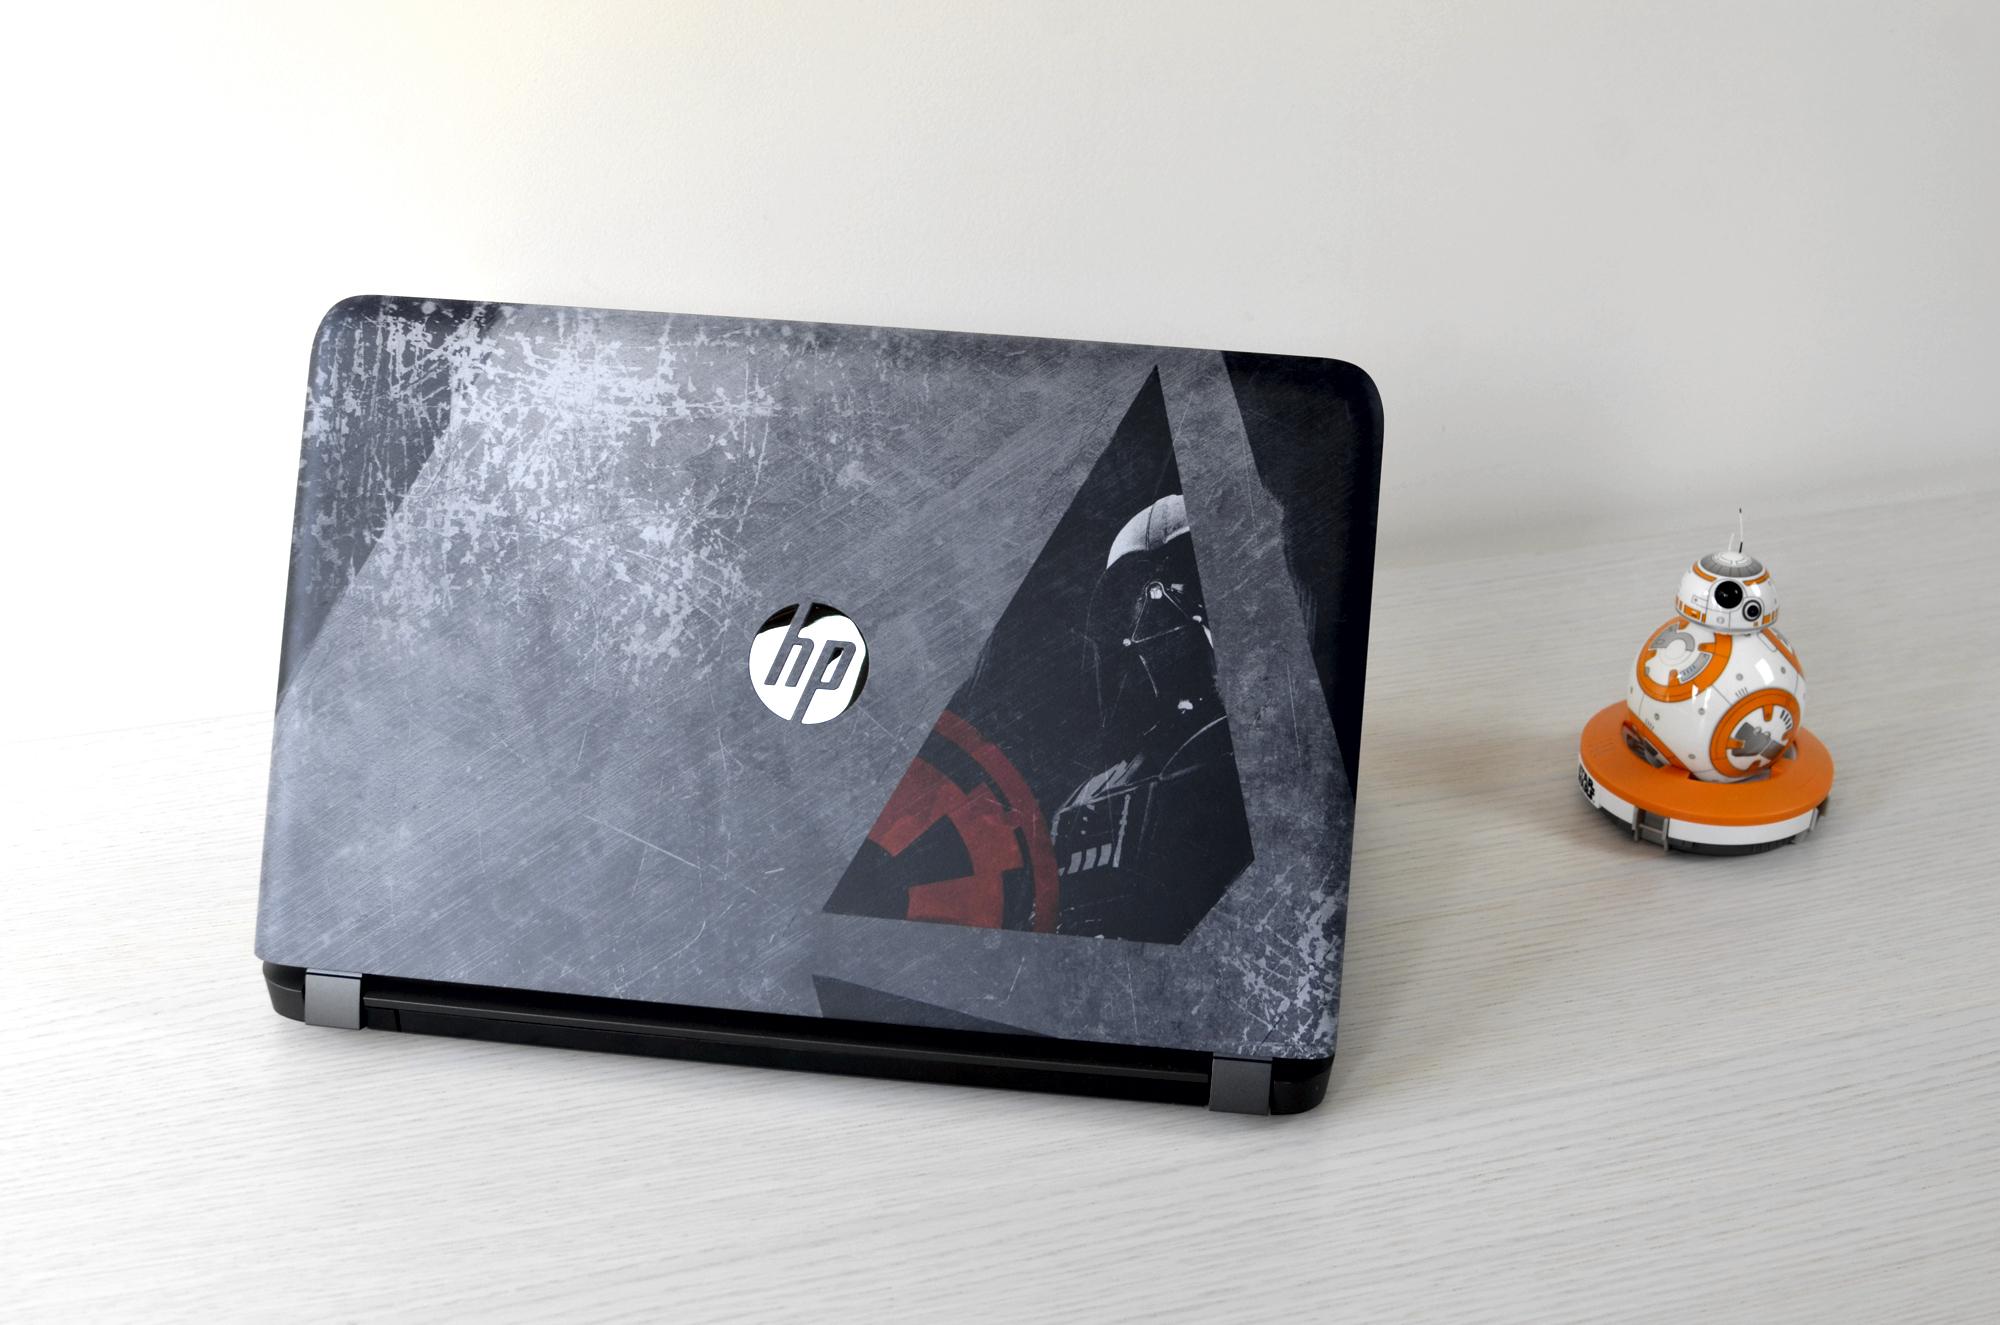 Foto de Portátil HP Star Wars (21/22)